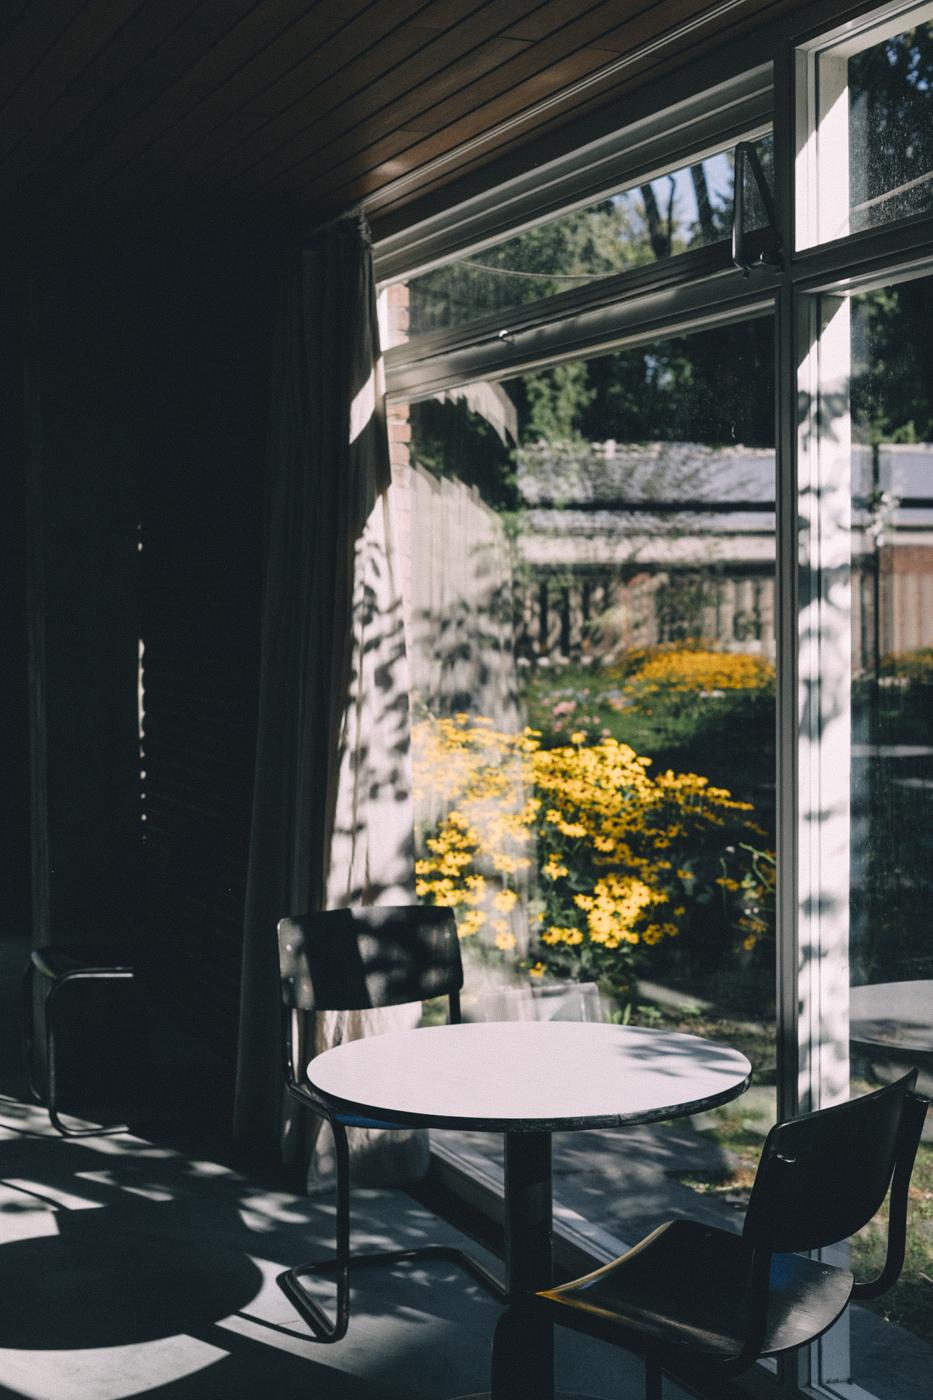 Silvia-Conde-Monocle-4057.jpg